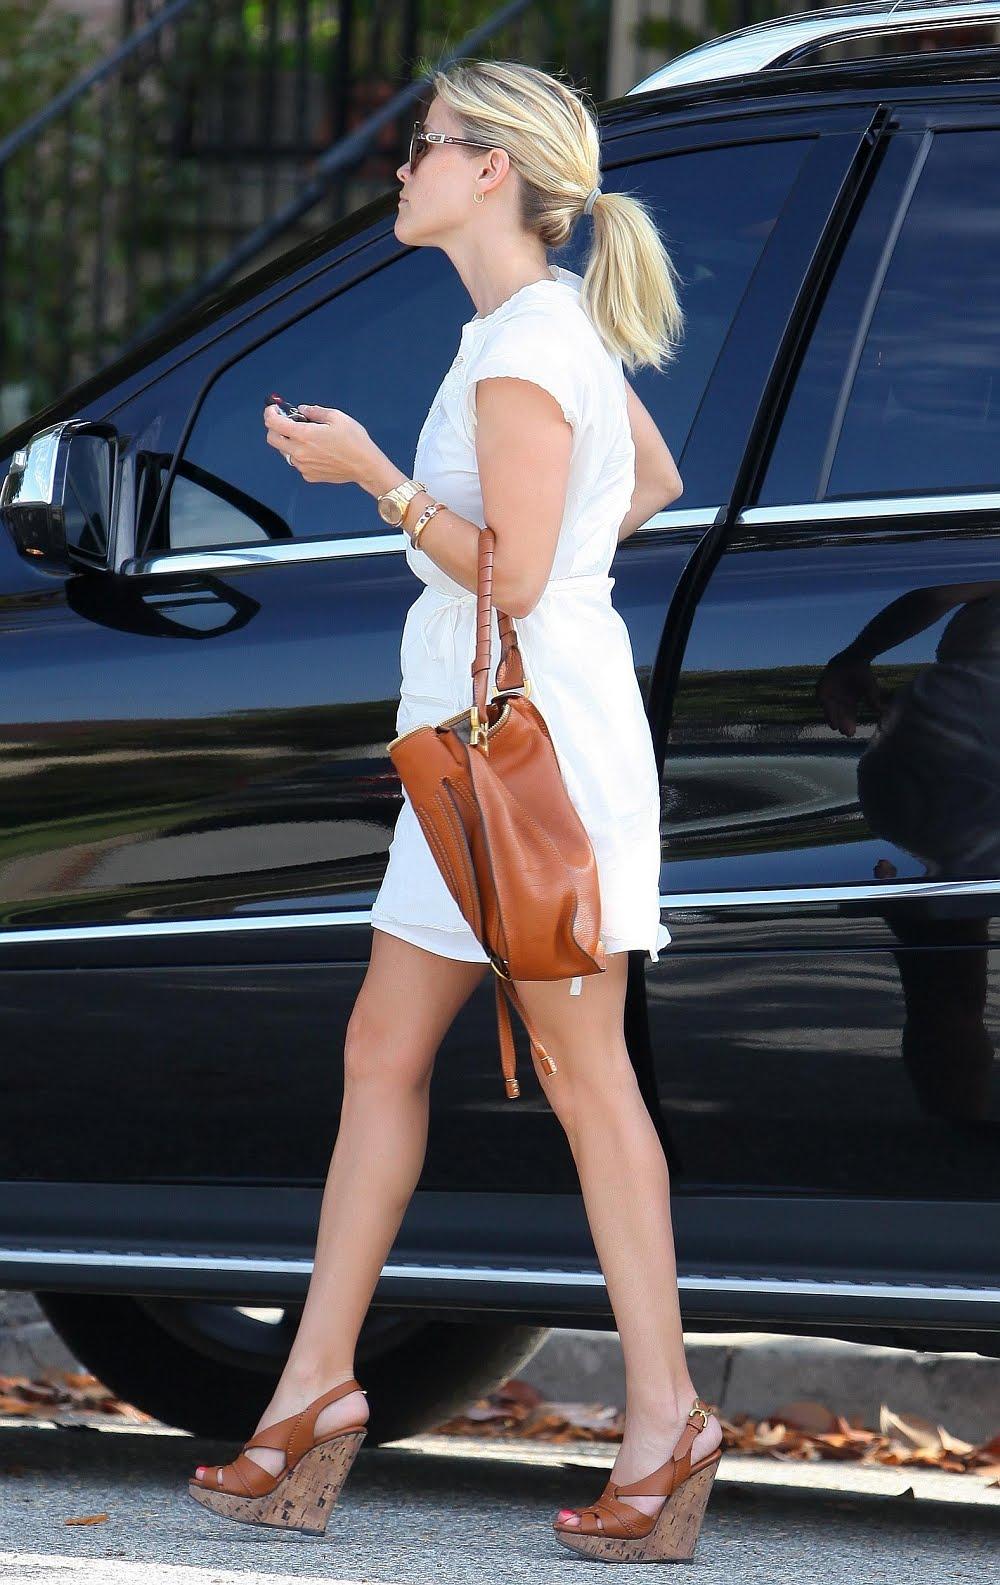 Best Celebrity Legs: Reese Witherspoon Has Beautiful Legs